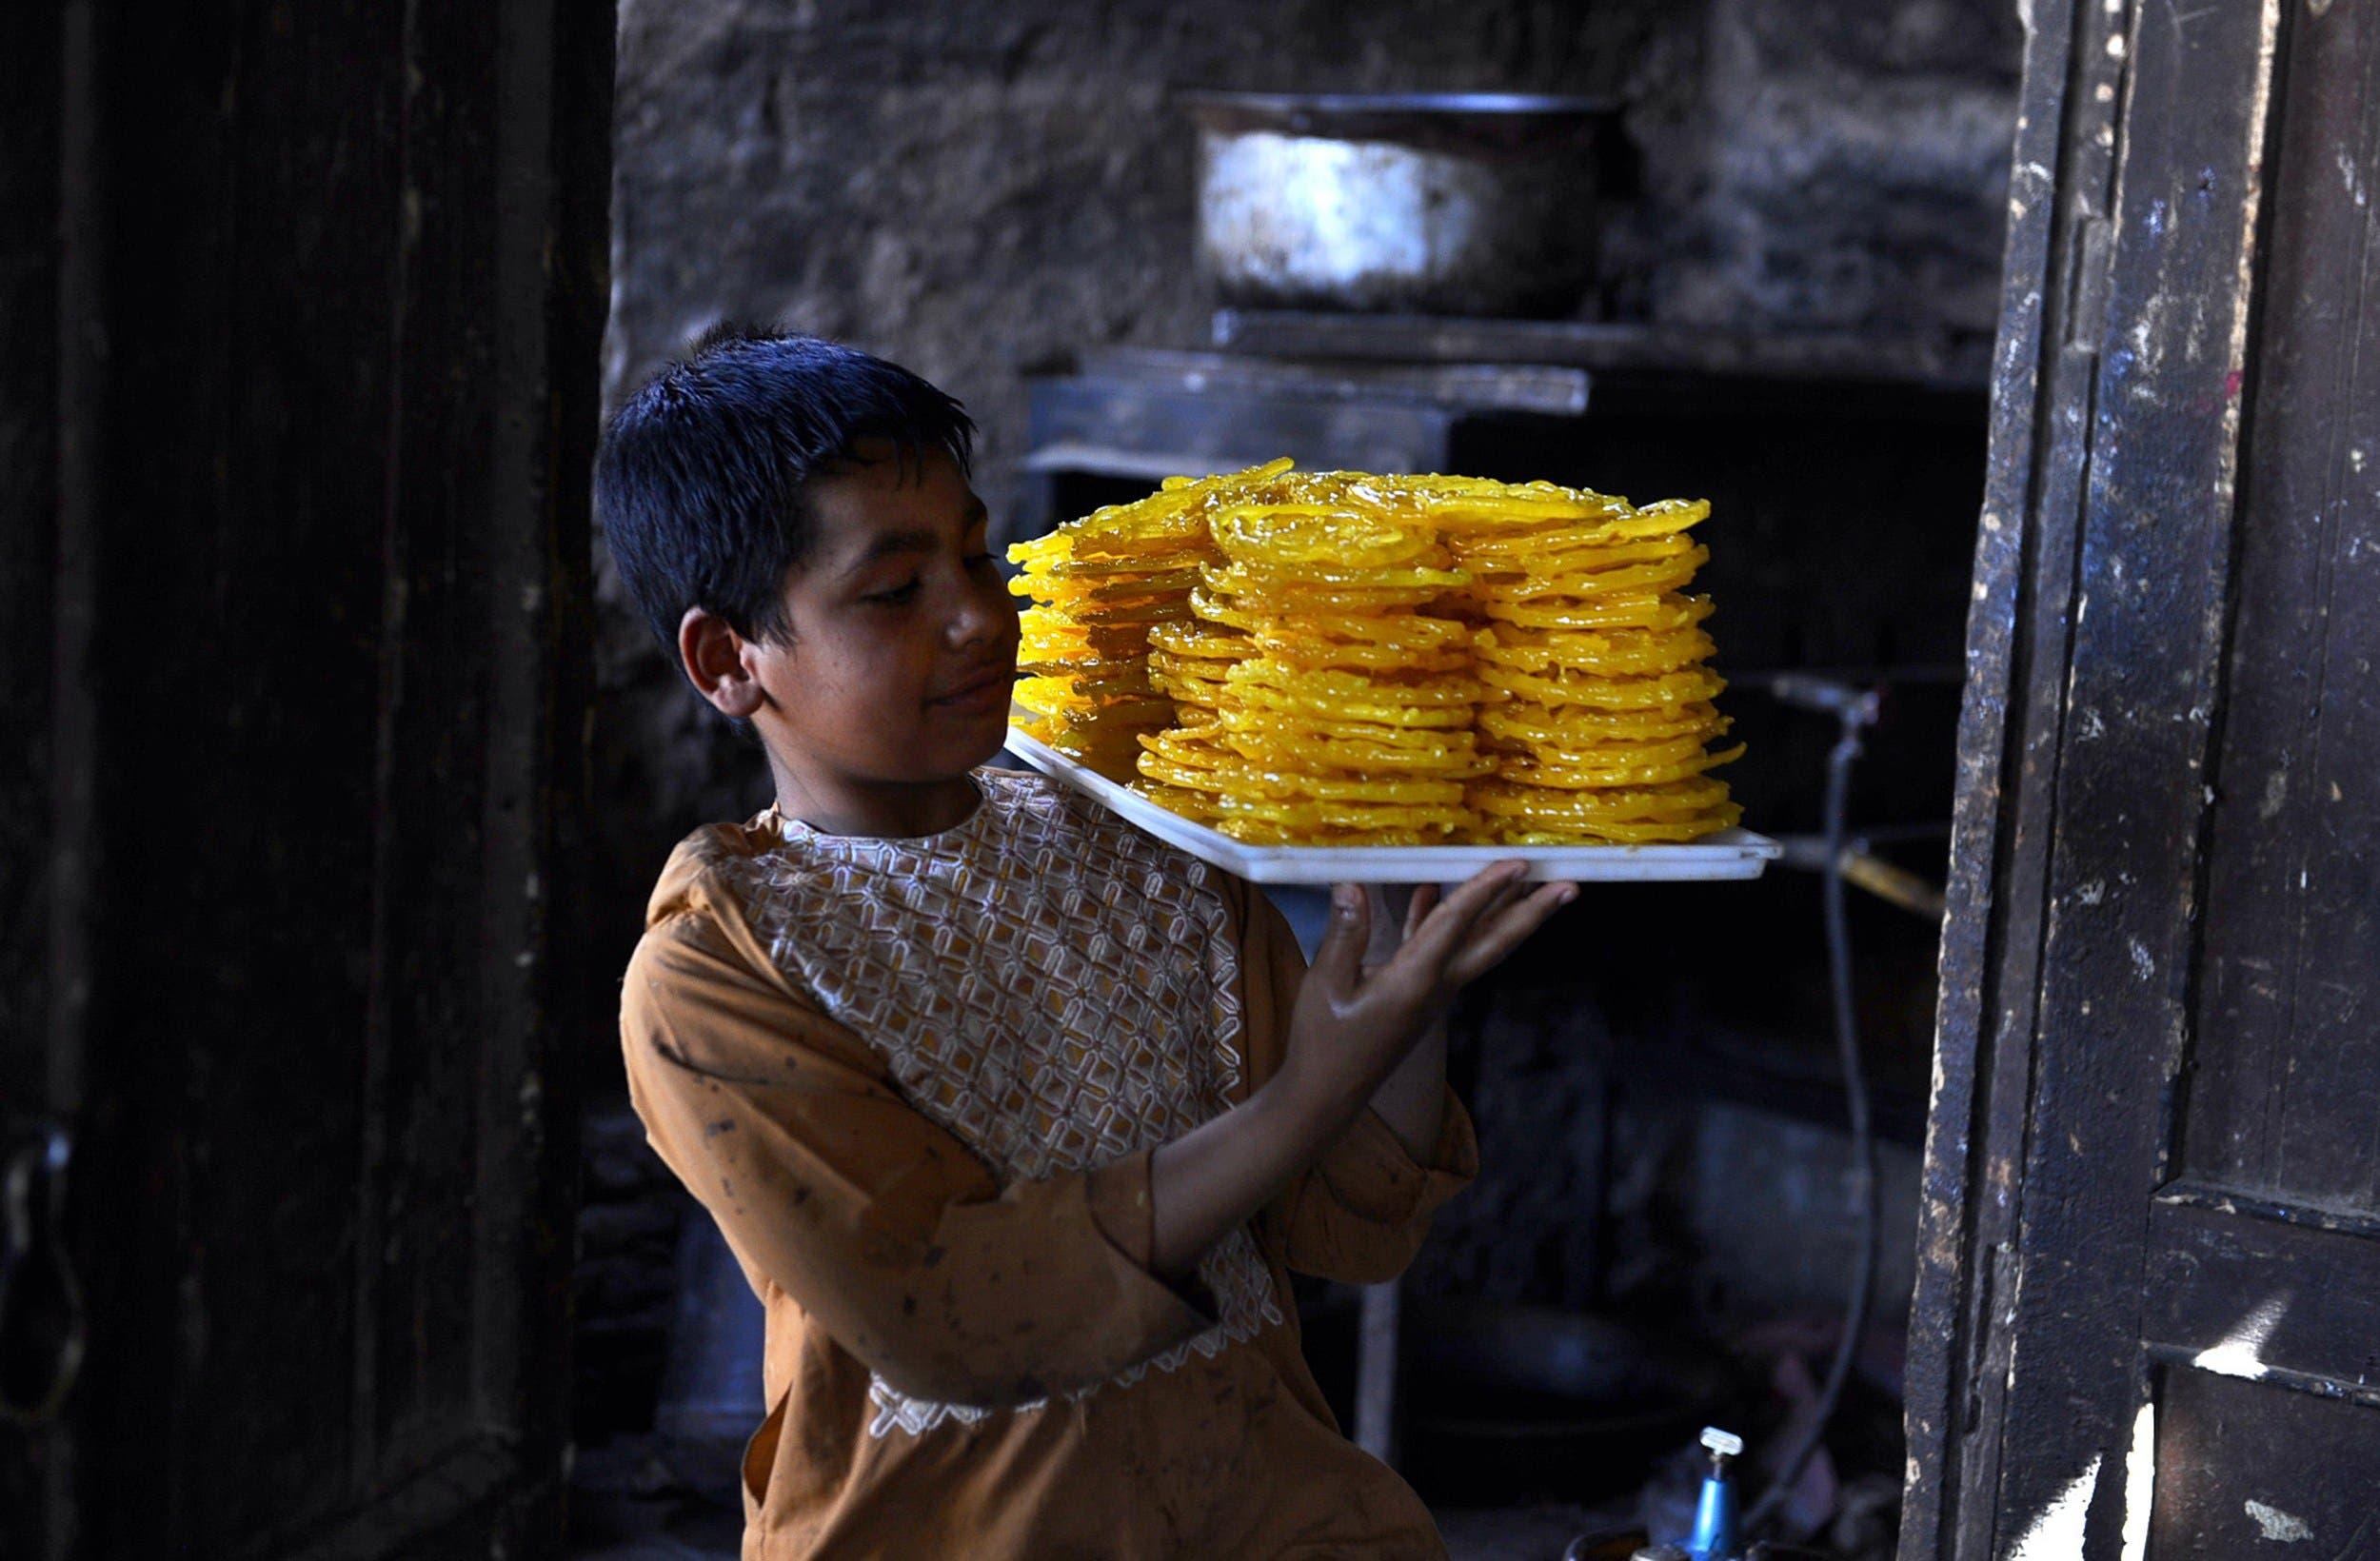 Afghanis cook up Ramadan treats